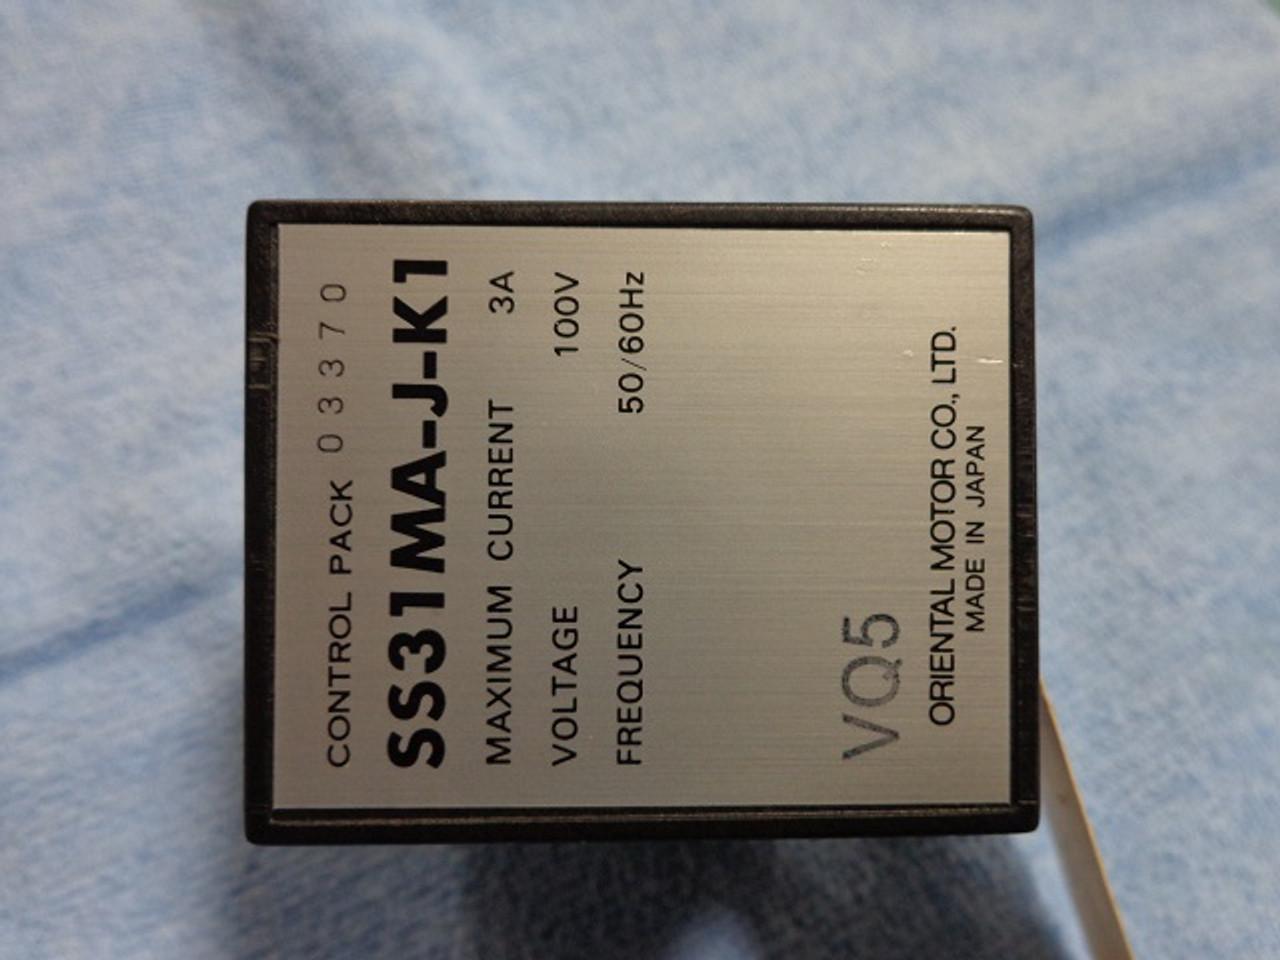 Oriental Motor SS31MA-J-K1 Control Pack